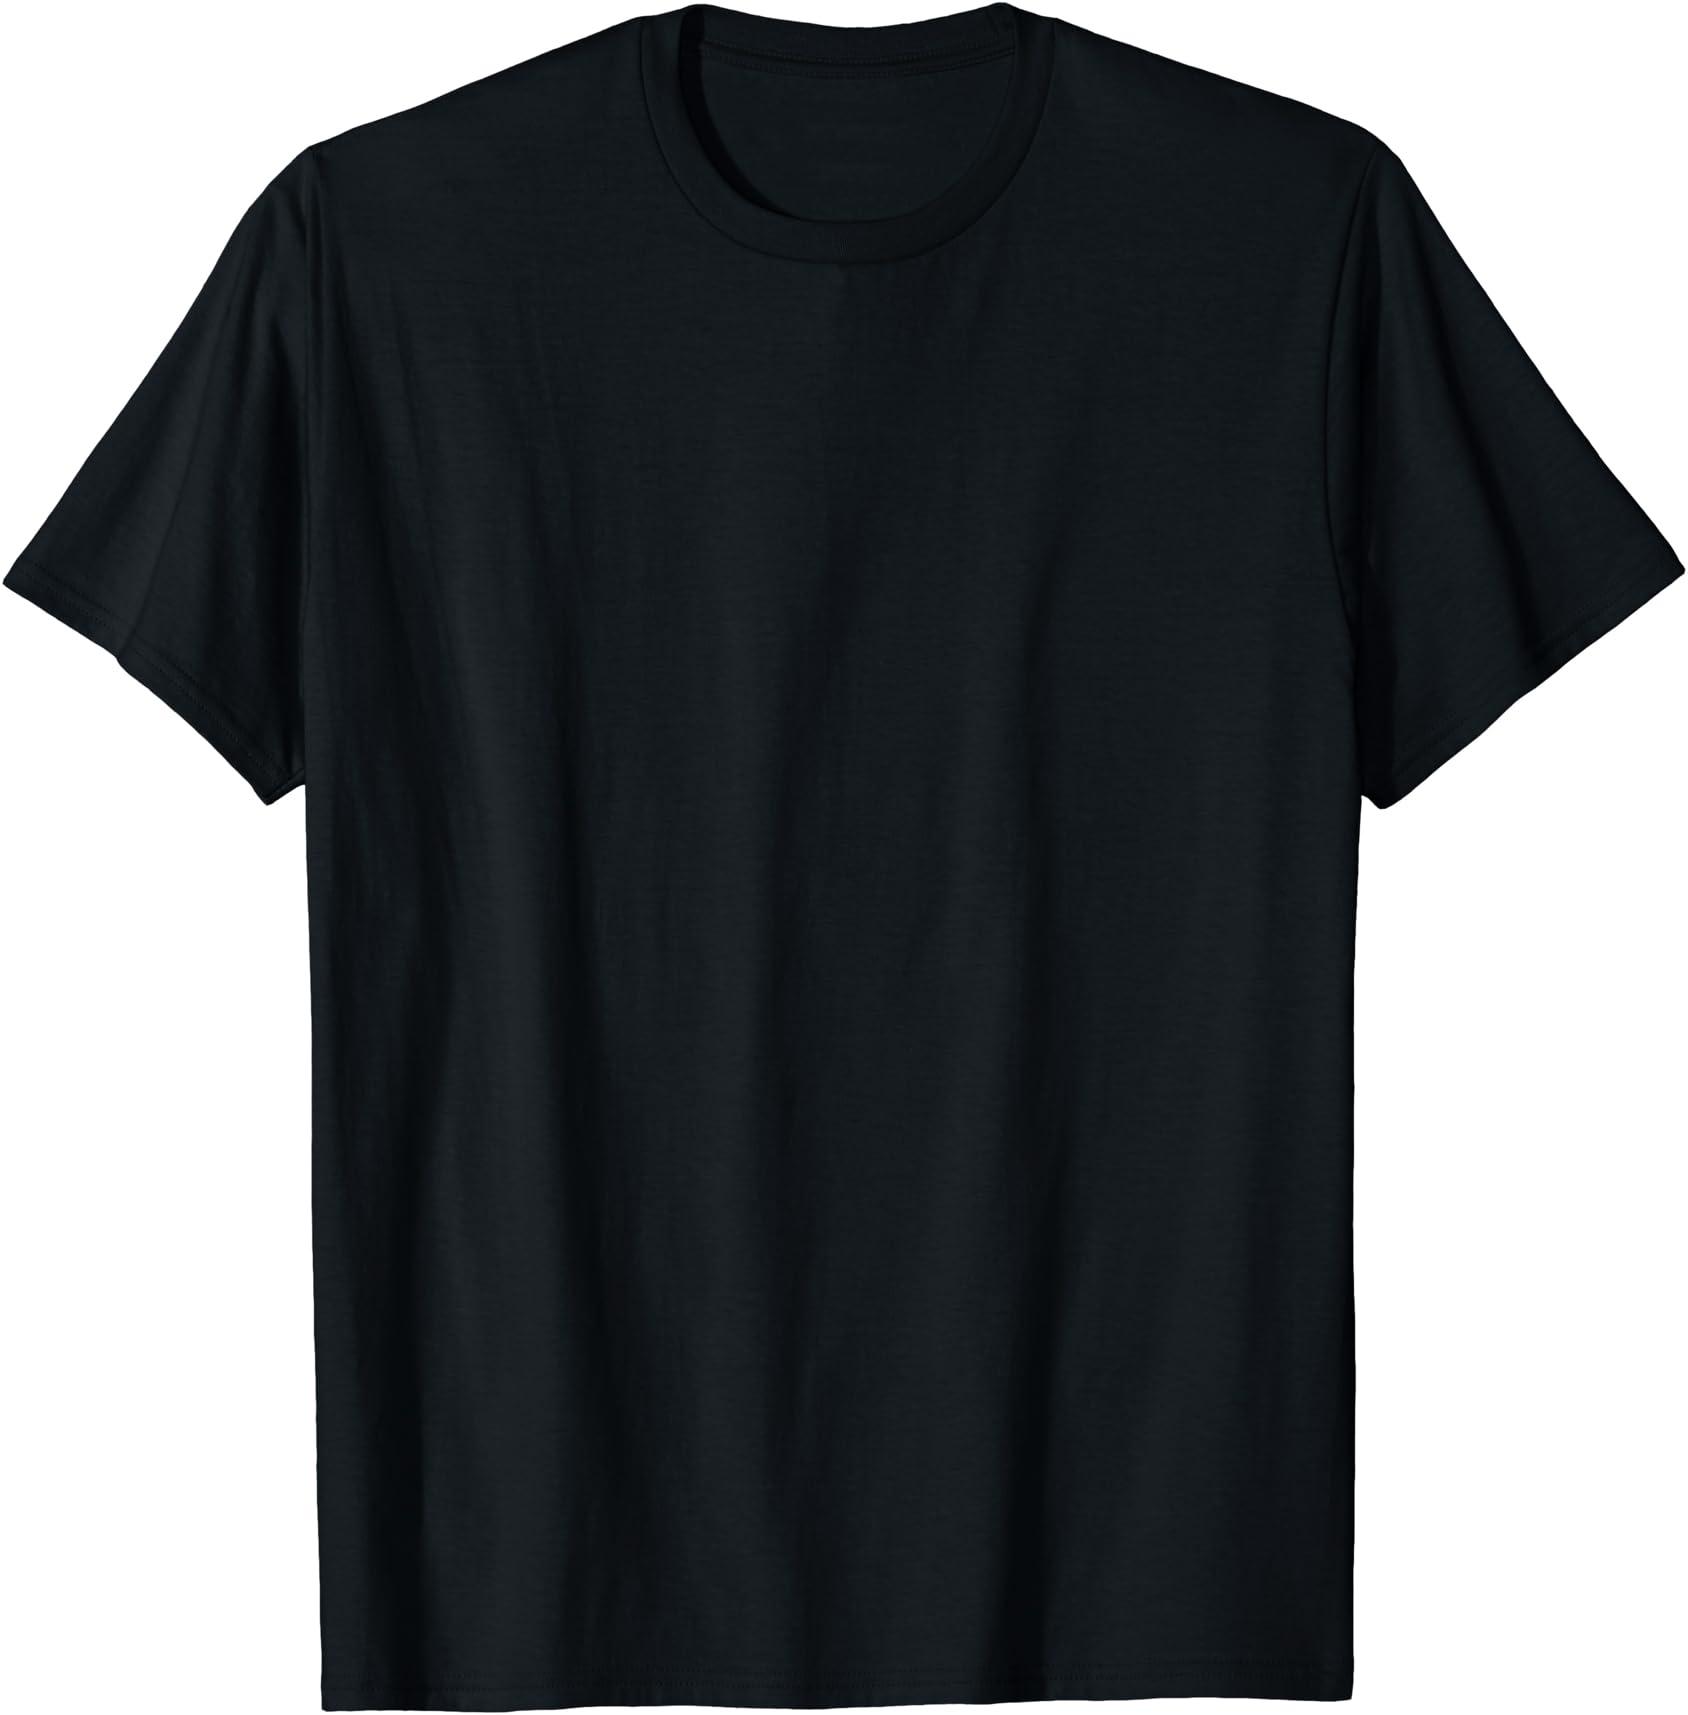 Baby Boys Girls Fashion Shirt Narwhal Love T-Shirt